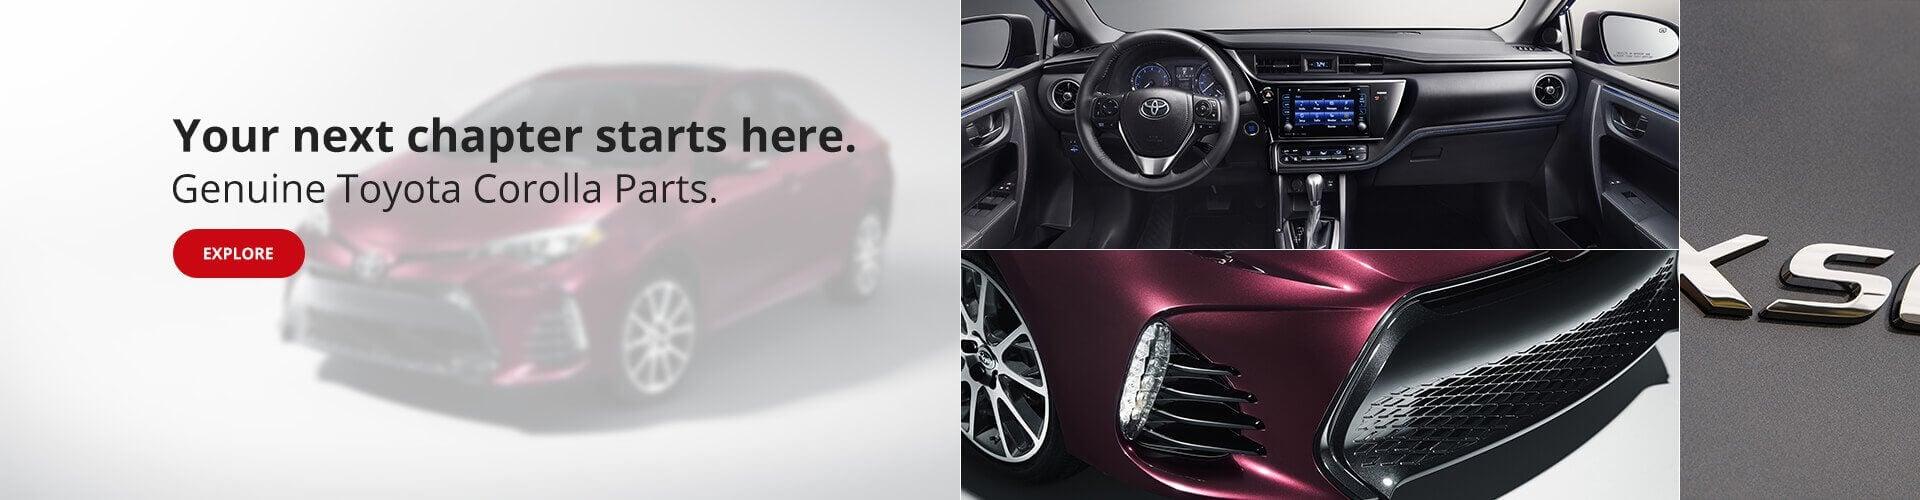 OEM Corolla Parts